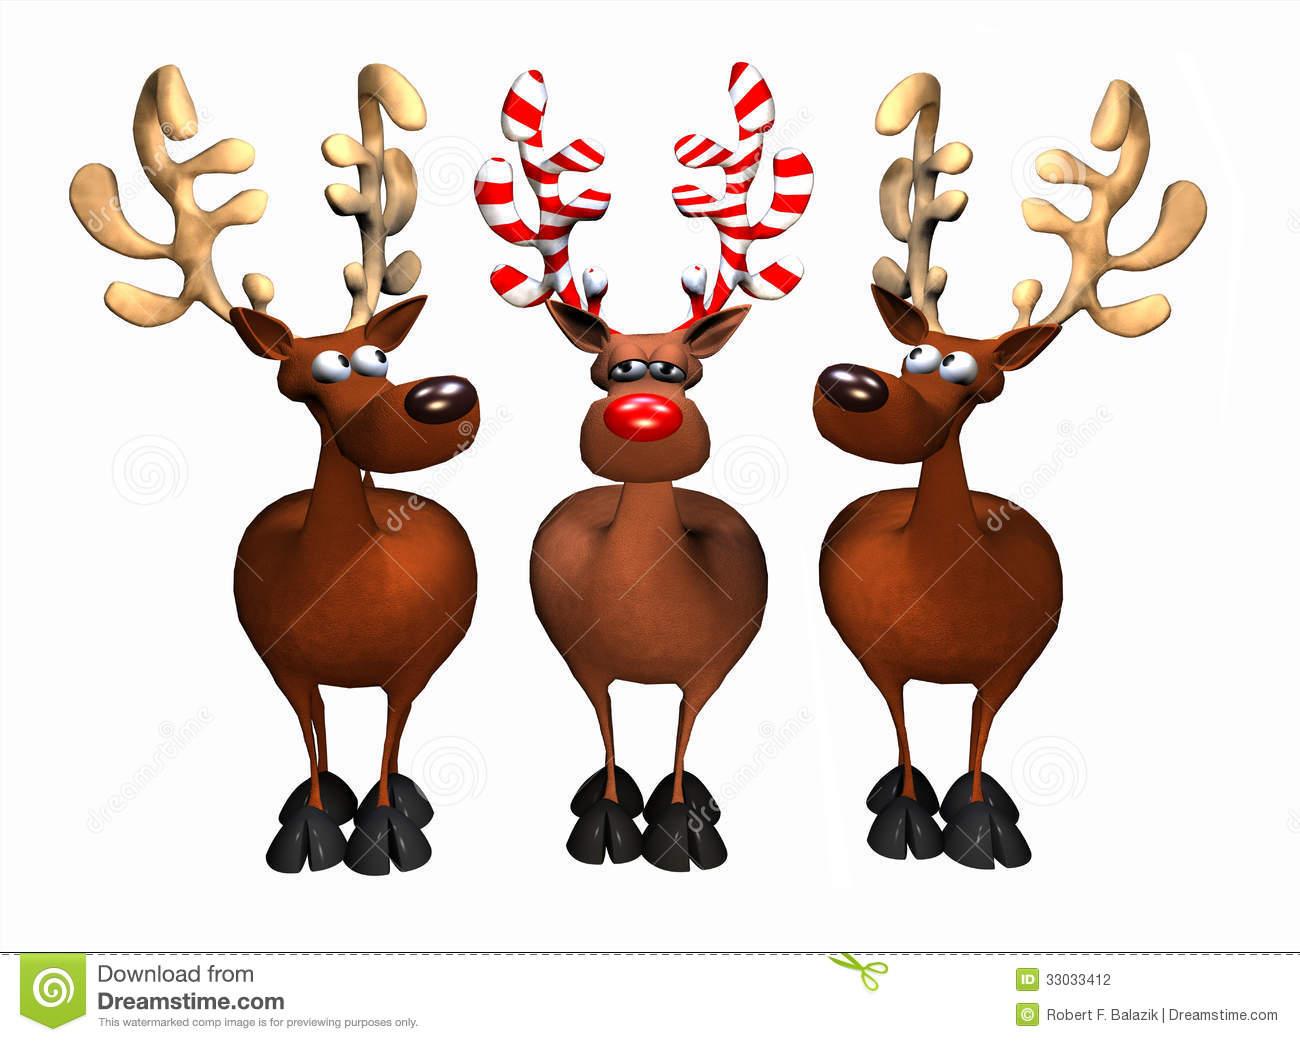 Flashing santa clipart banner download Flashing reindeer clipart - ClipartFest banner download